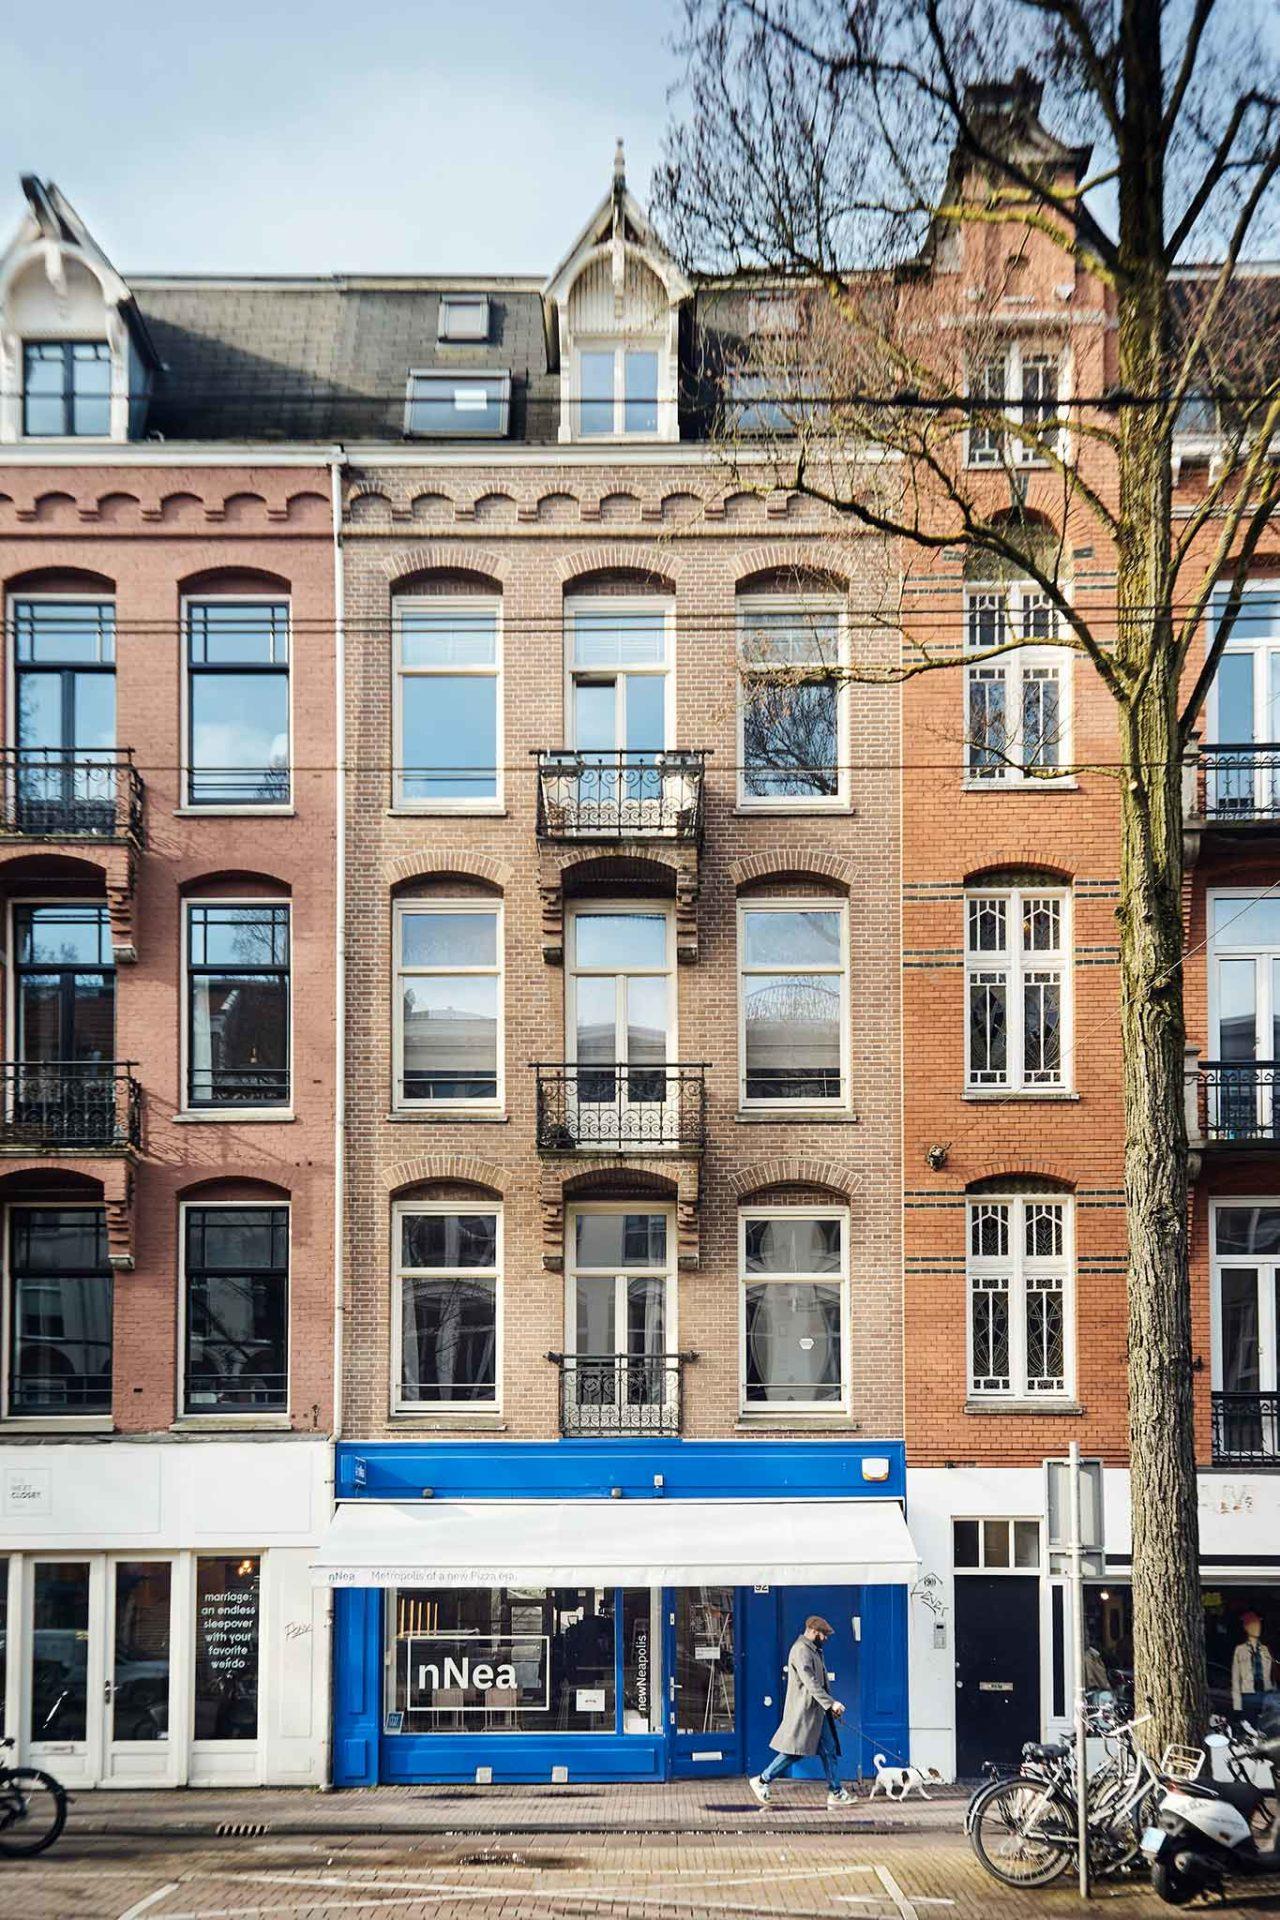 nNea Amsterdam